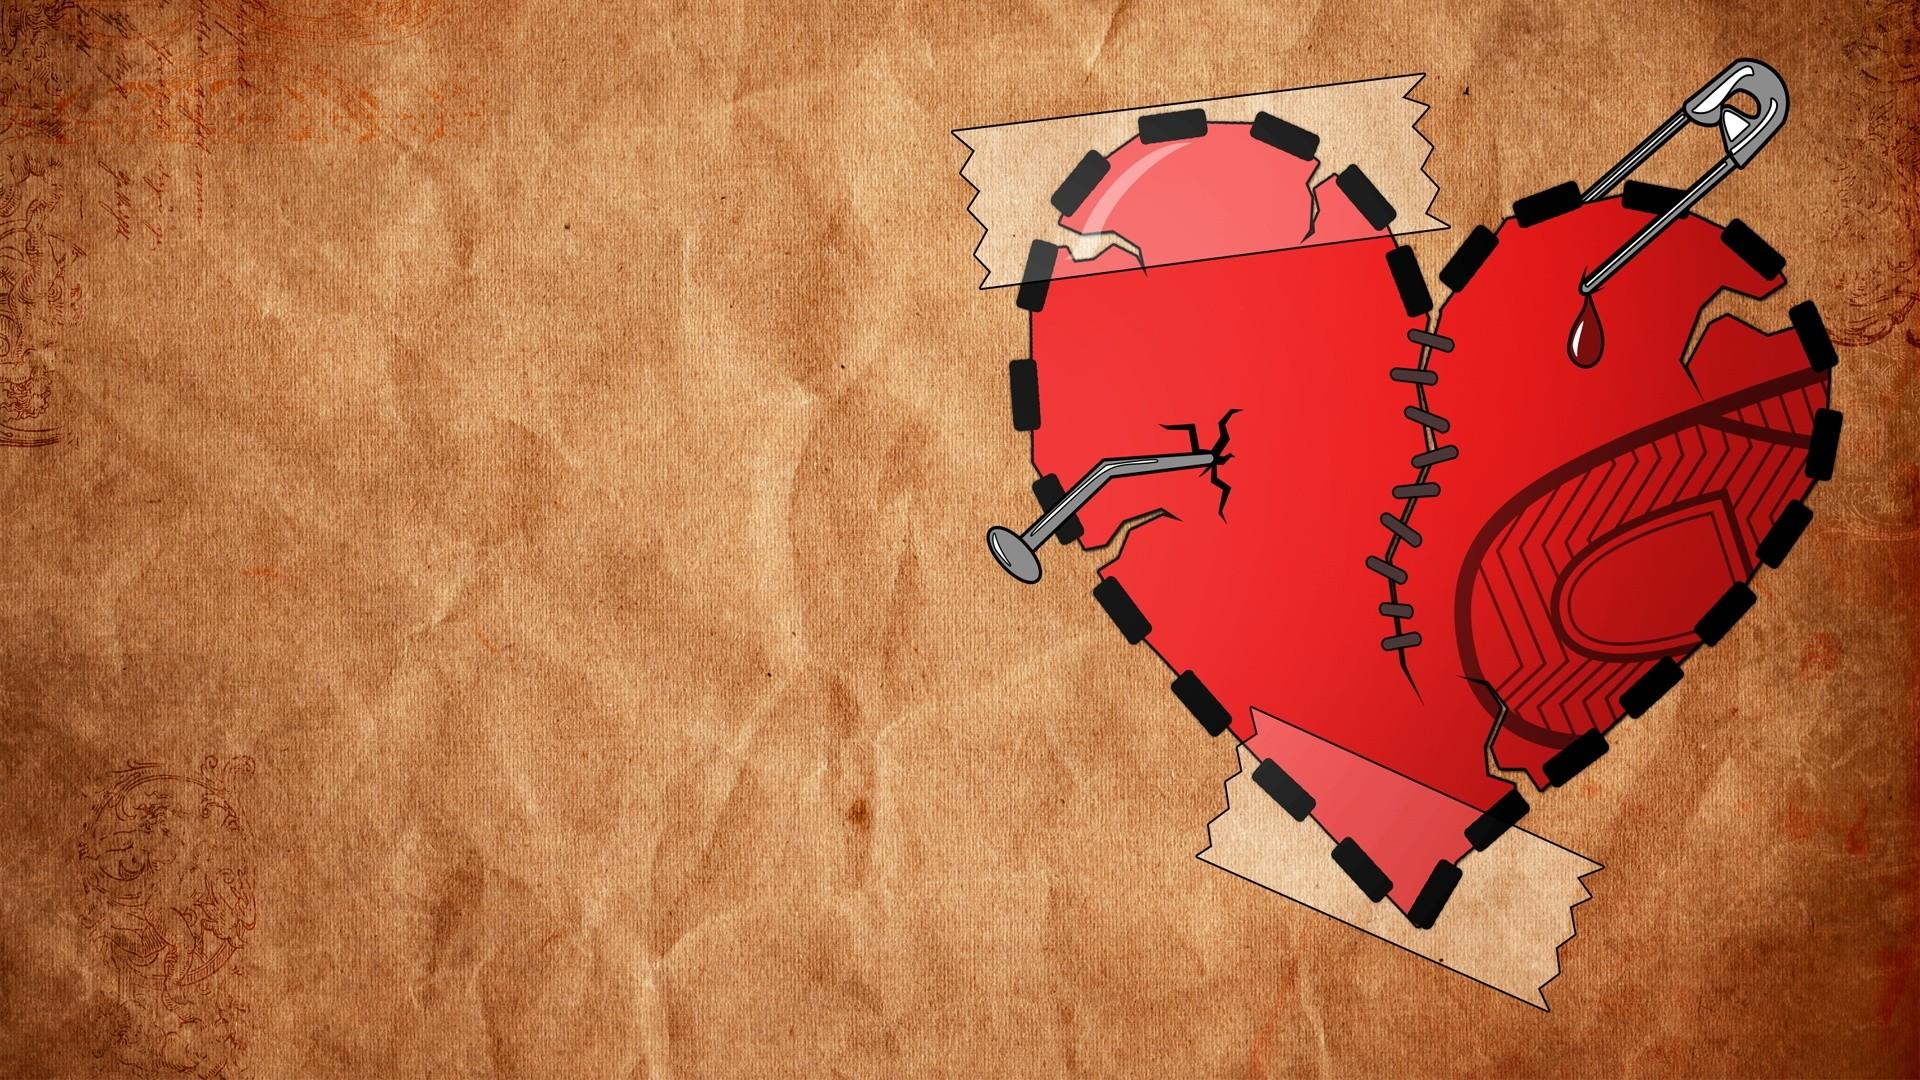 Broken Heart Free Wallpaper and Background